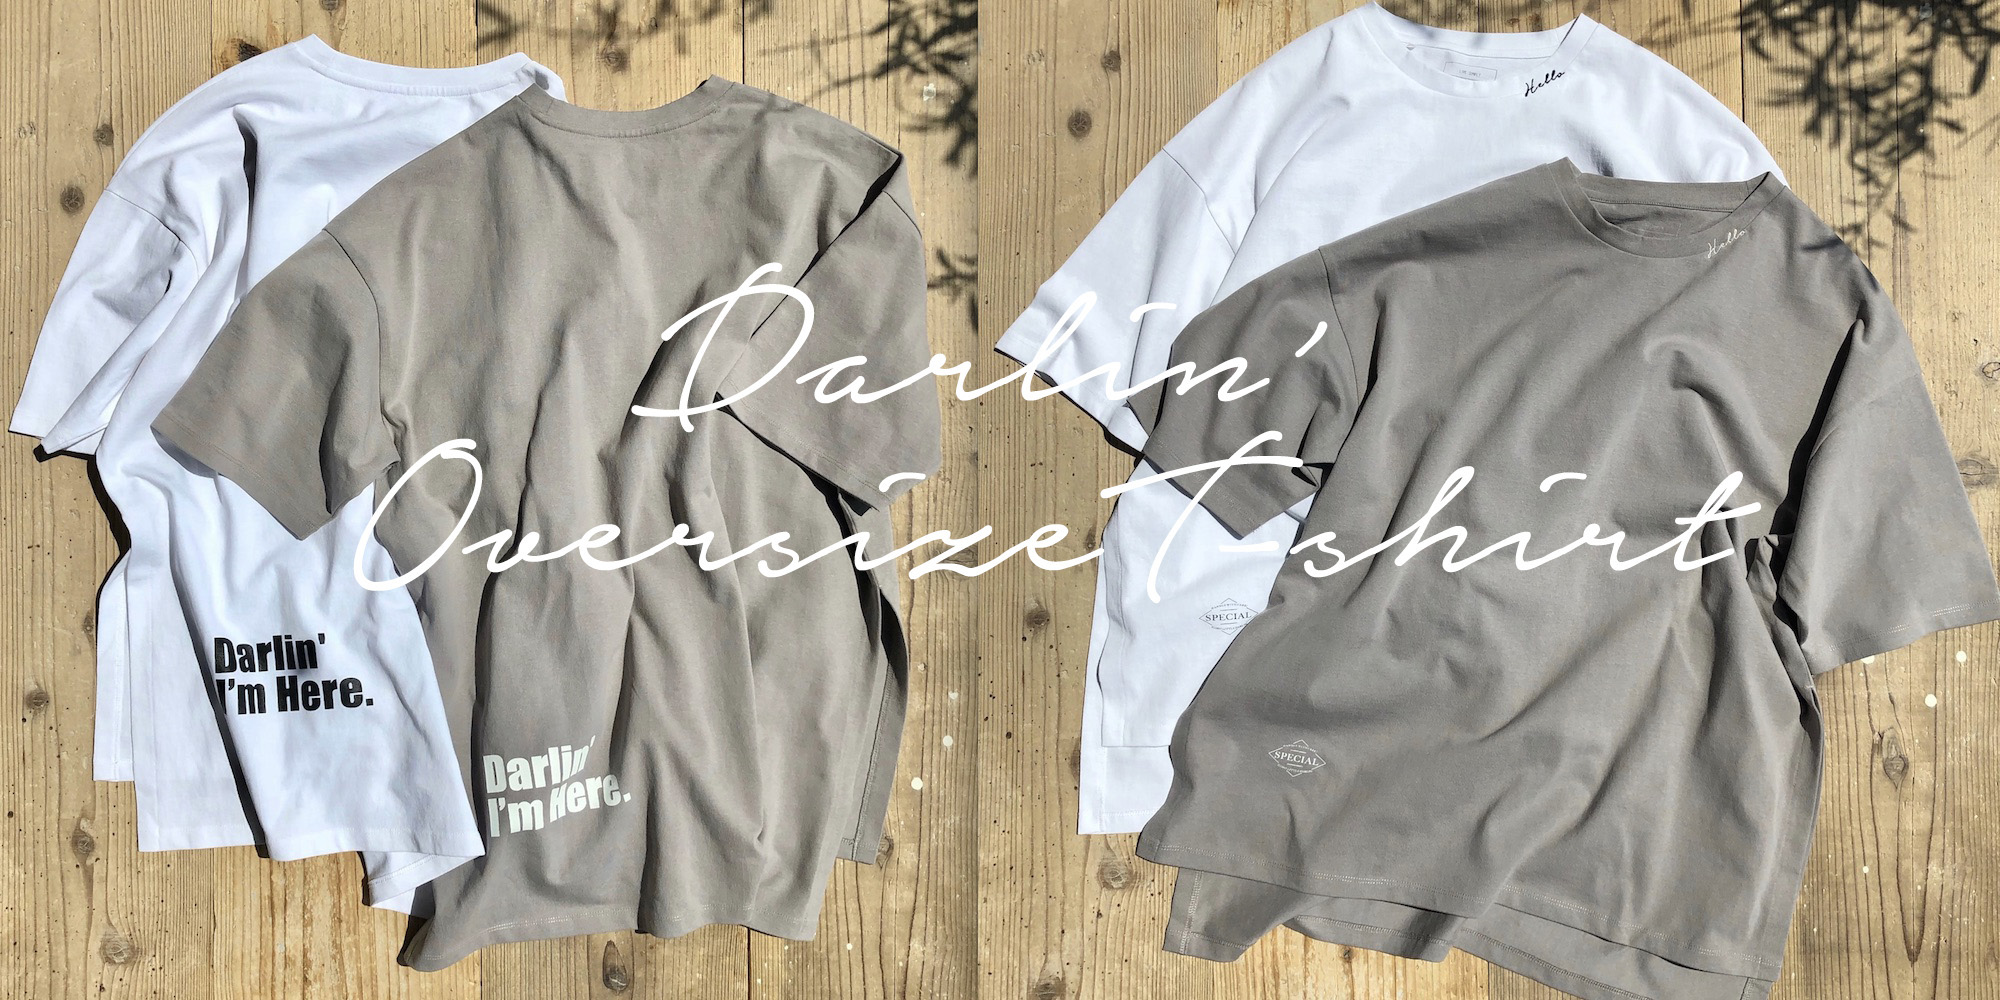 DarlinオーバーサイズTシャツTOPのコピー